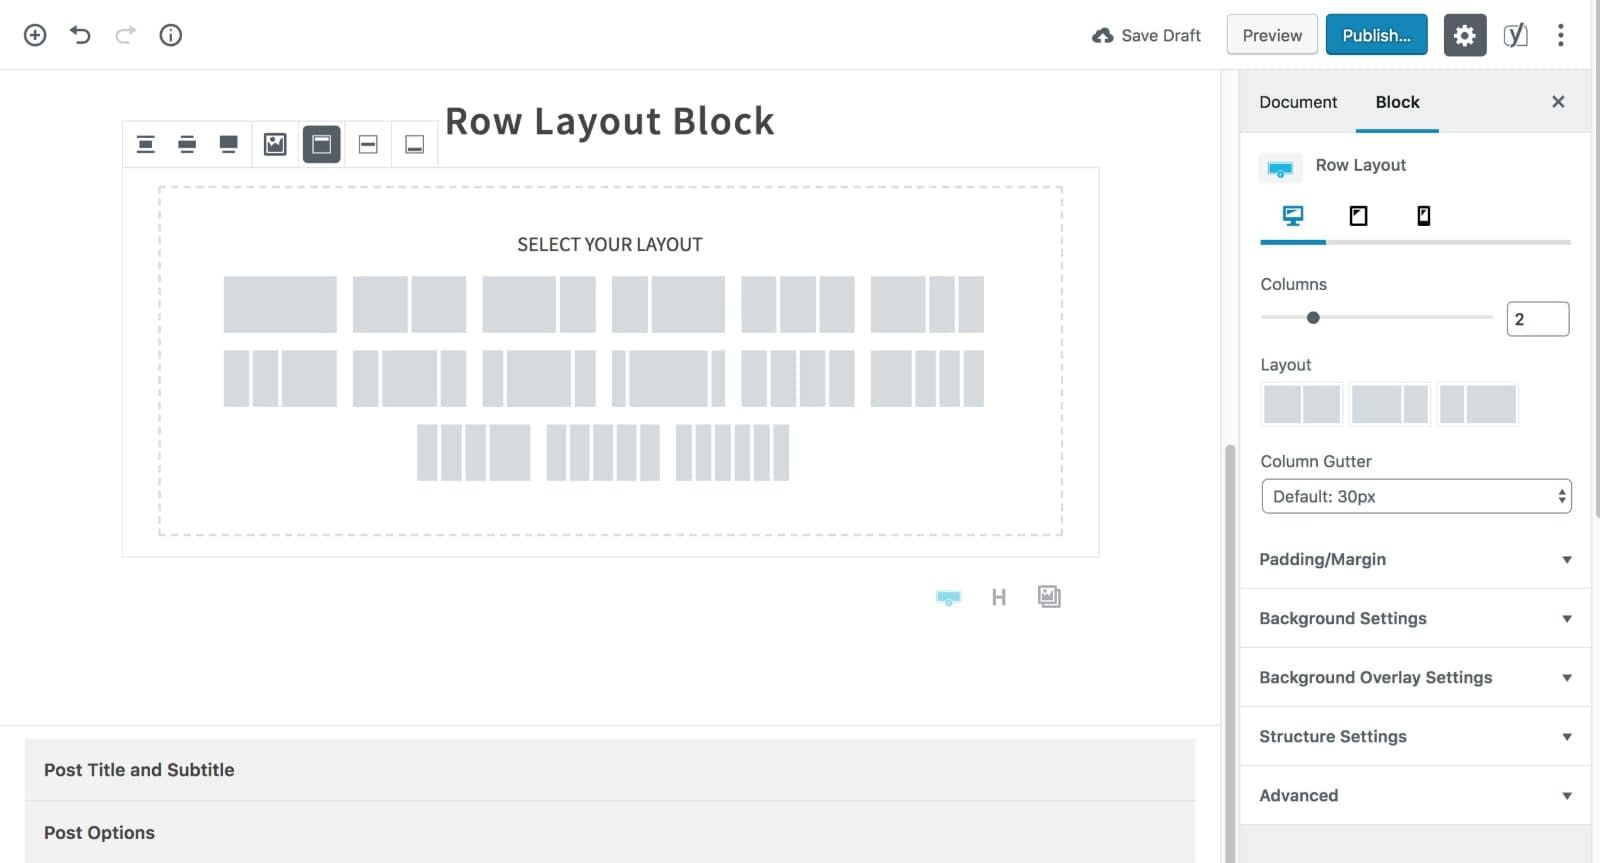 Select Row Layout